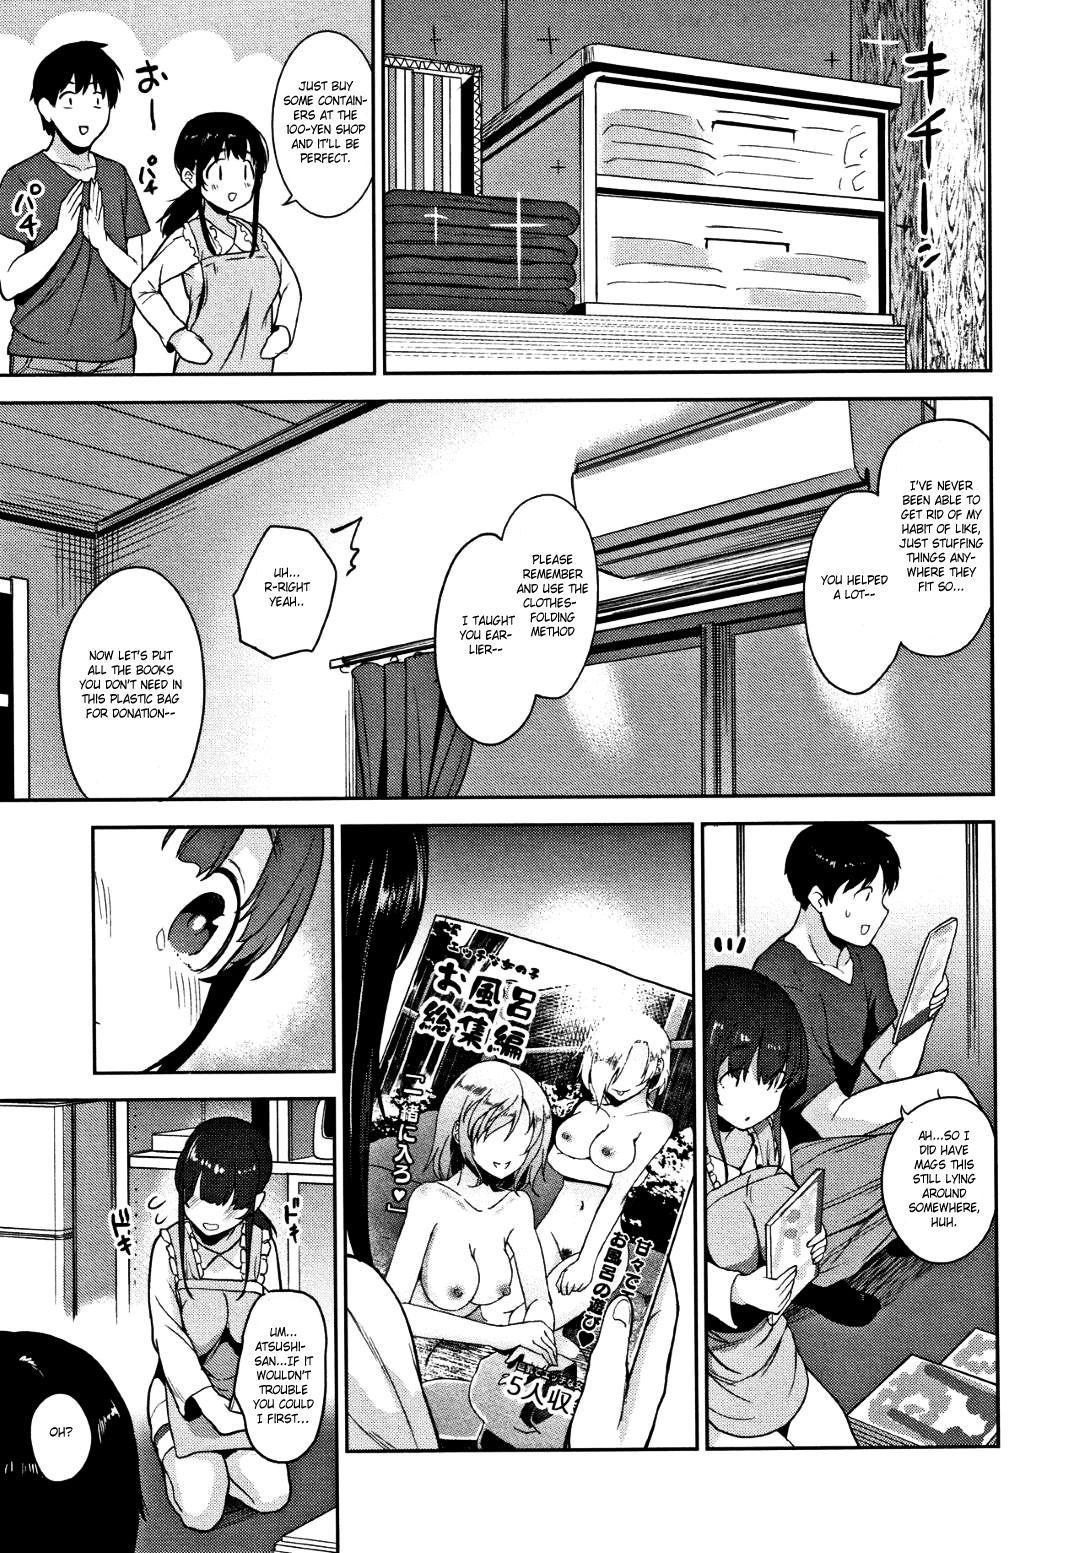 [Azuse] Kawaii Onnanoko o Tsuru Houhou - Method to catch a pretty girl Ch. 1-5 [English] [GMDTranslations] 104